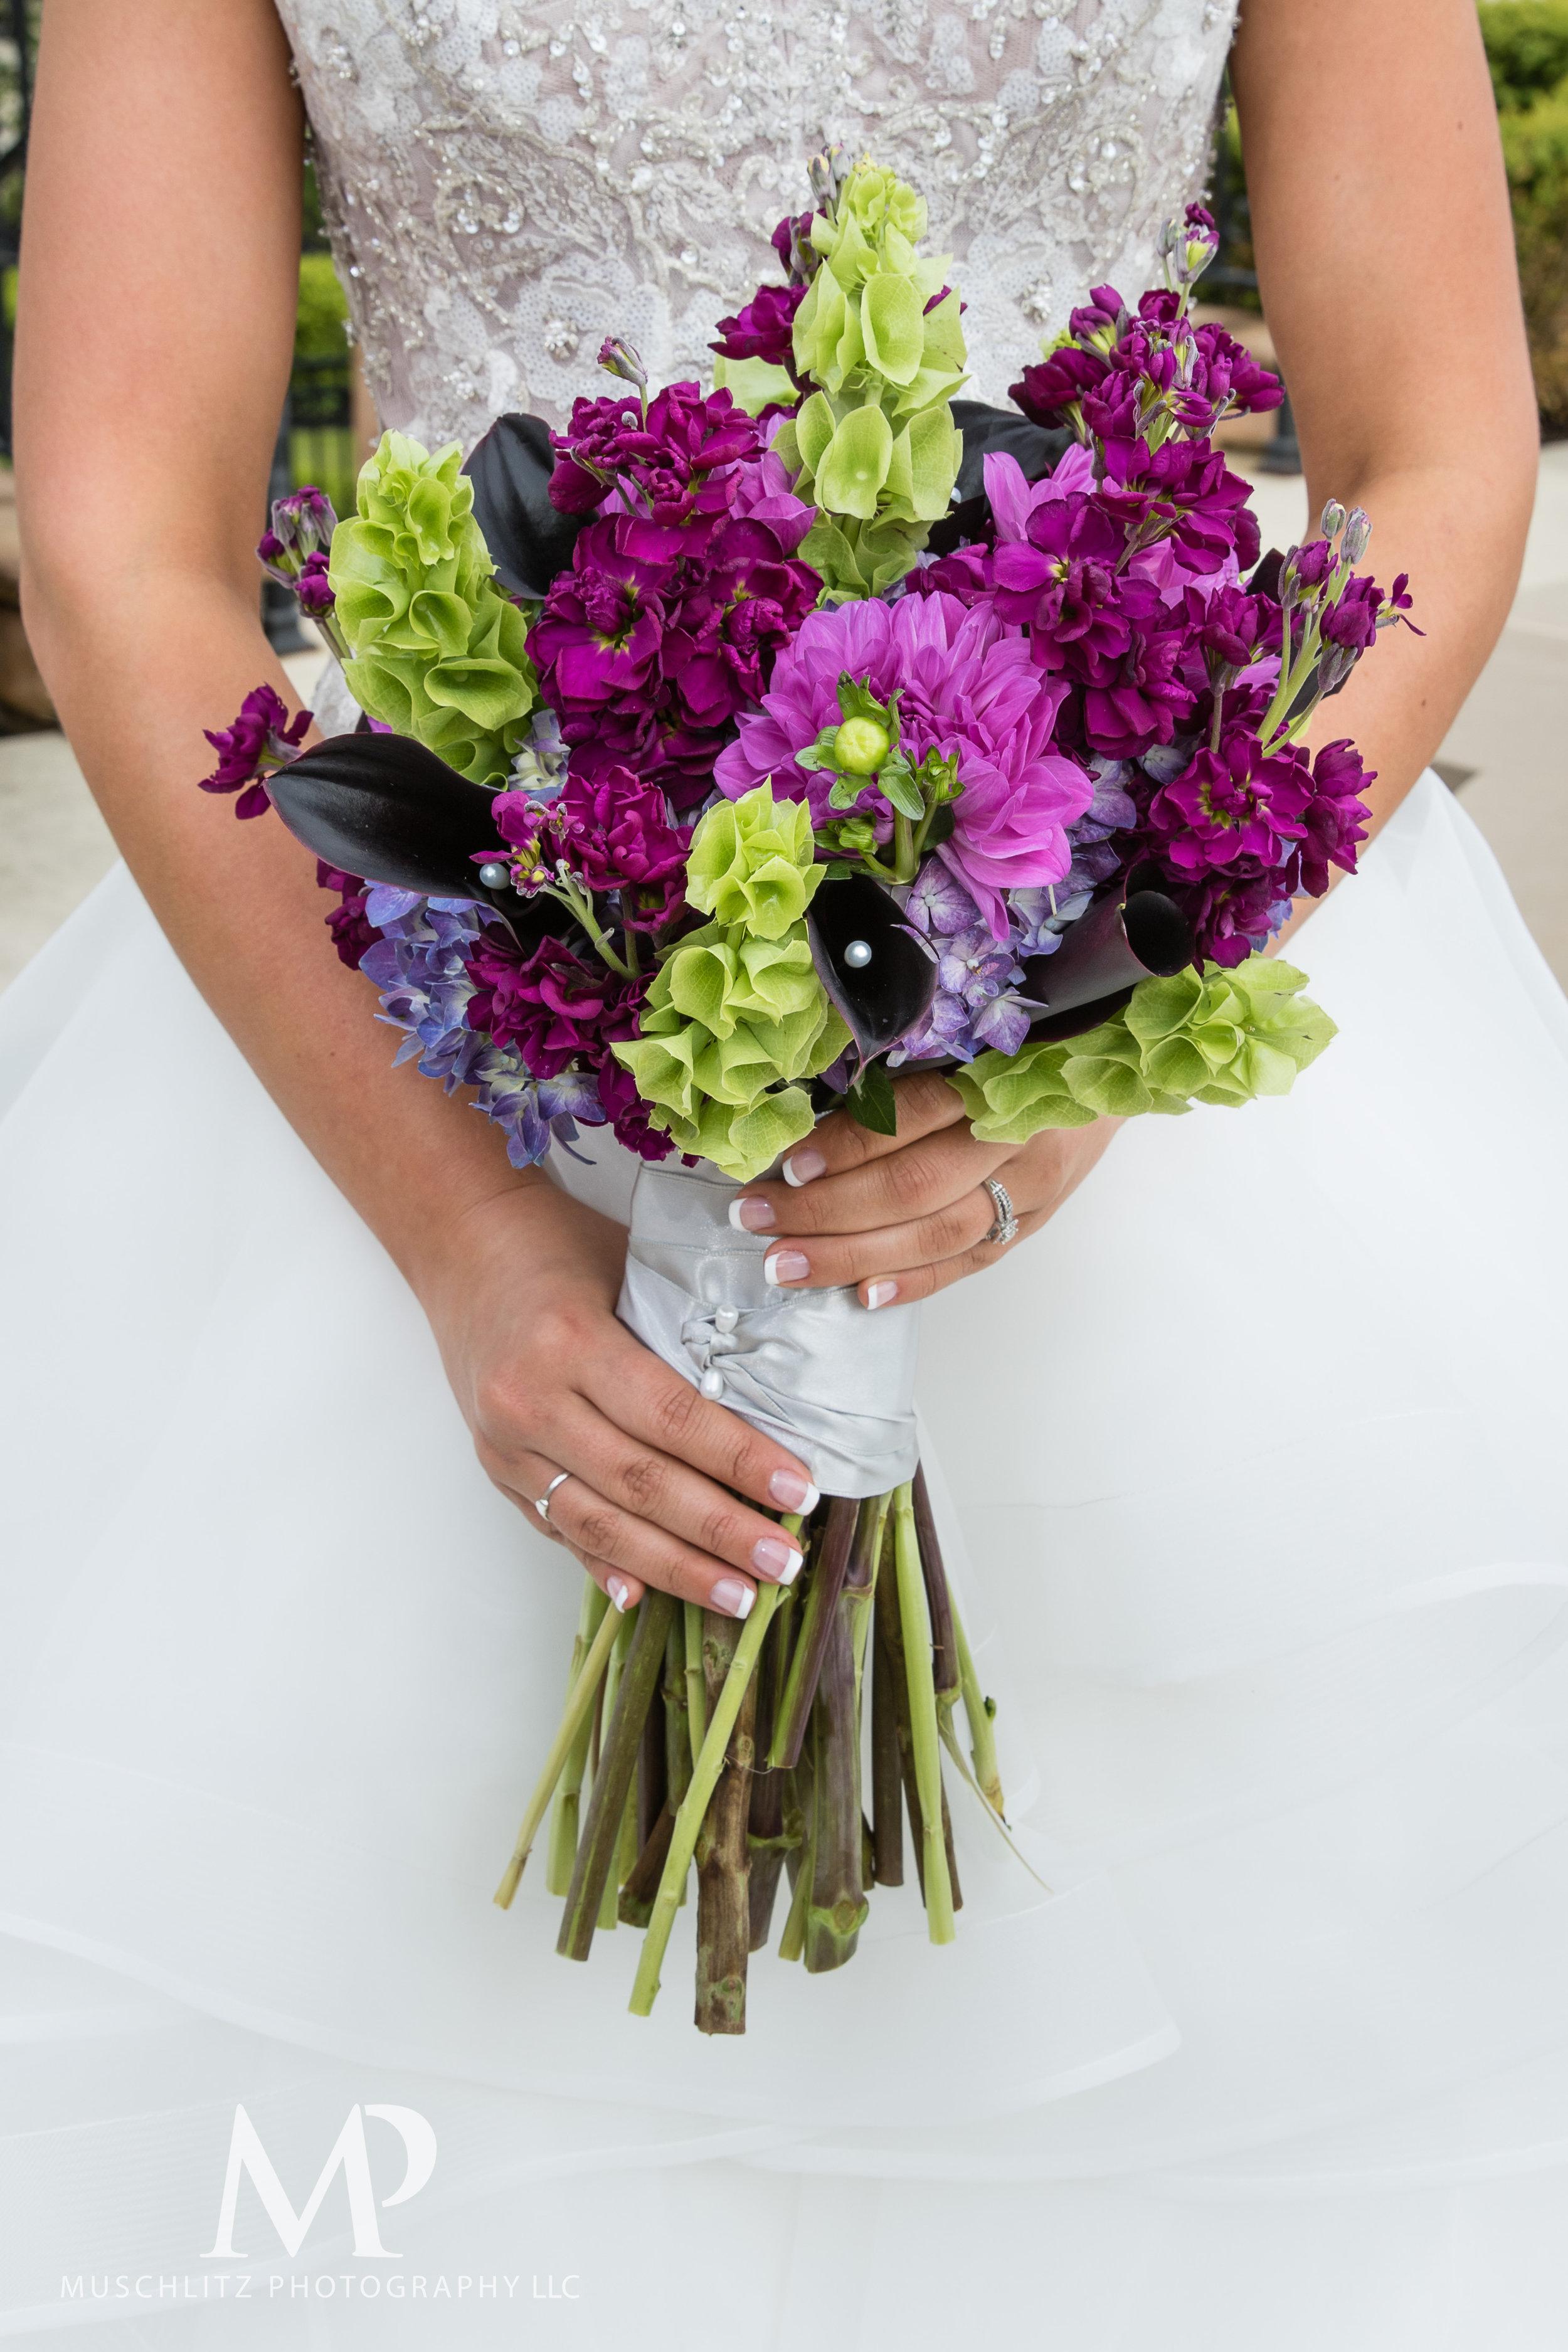 club-at-corazon-wedding-ceremony-reception-columbus-dublin-ohio-ohio-university-theme-053.JPG